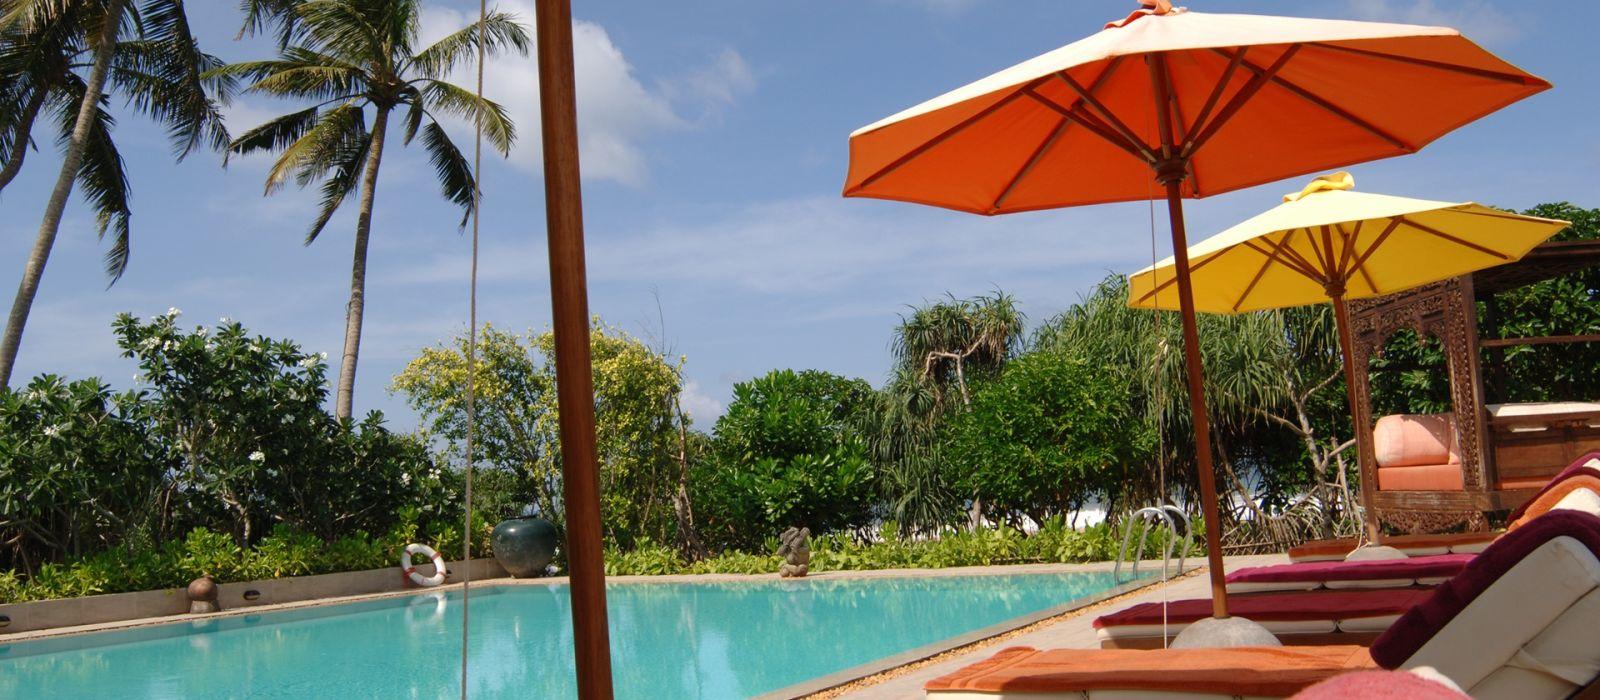 Hotel Aditya Sri Lanka